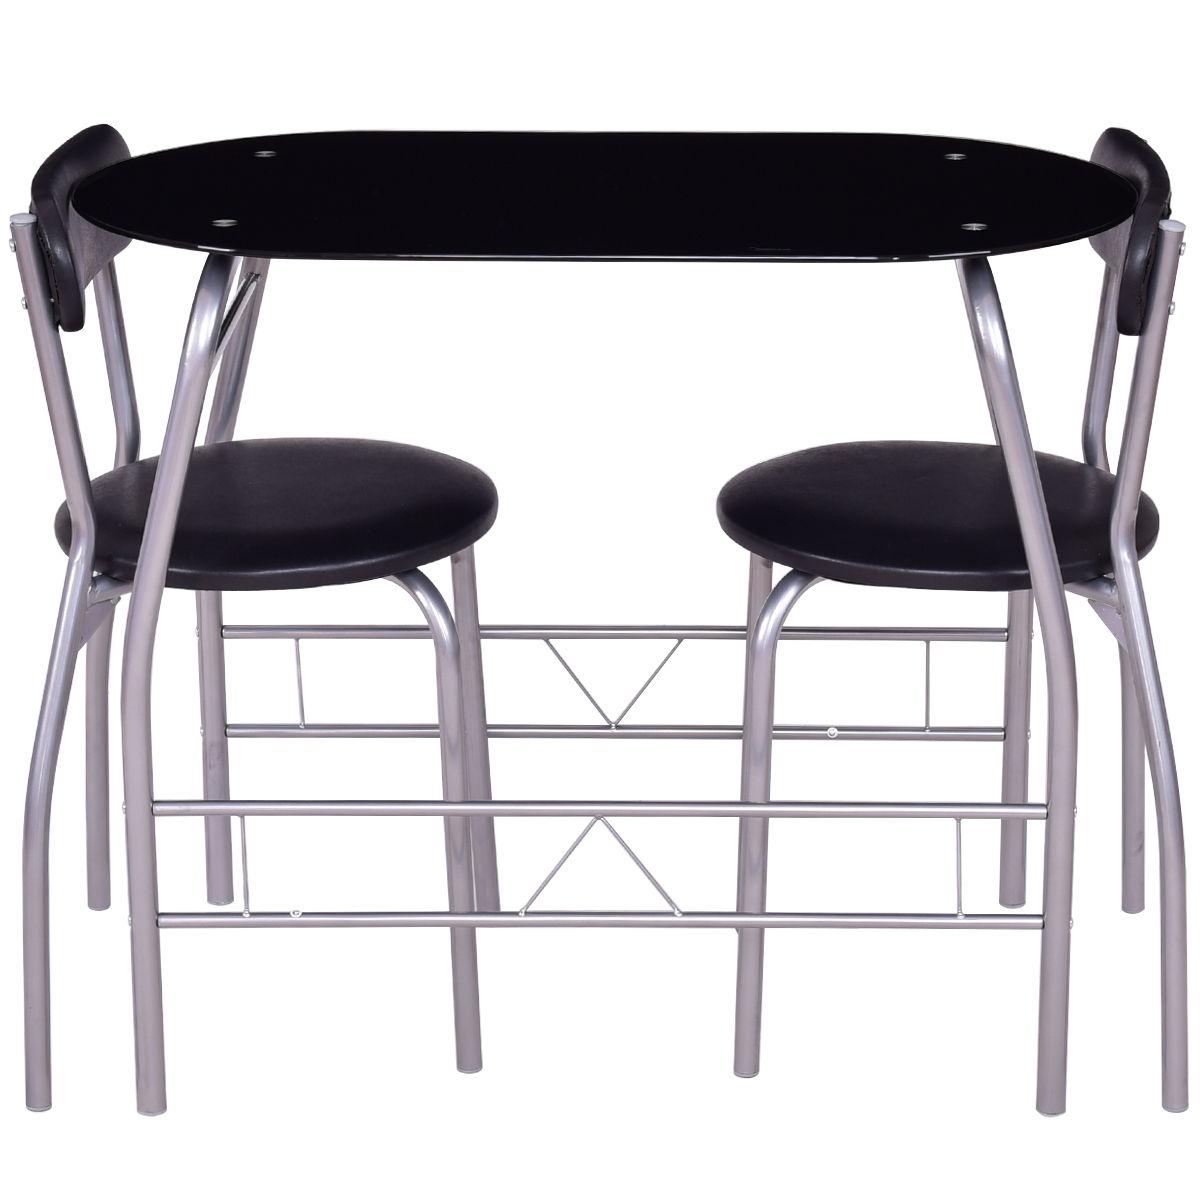 3 pcs Tempered Glass Dining Furniture Set